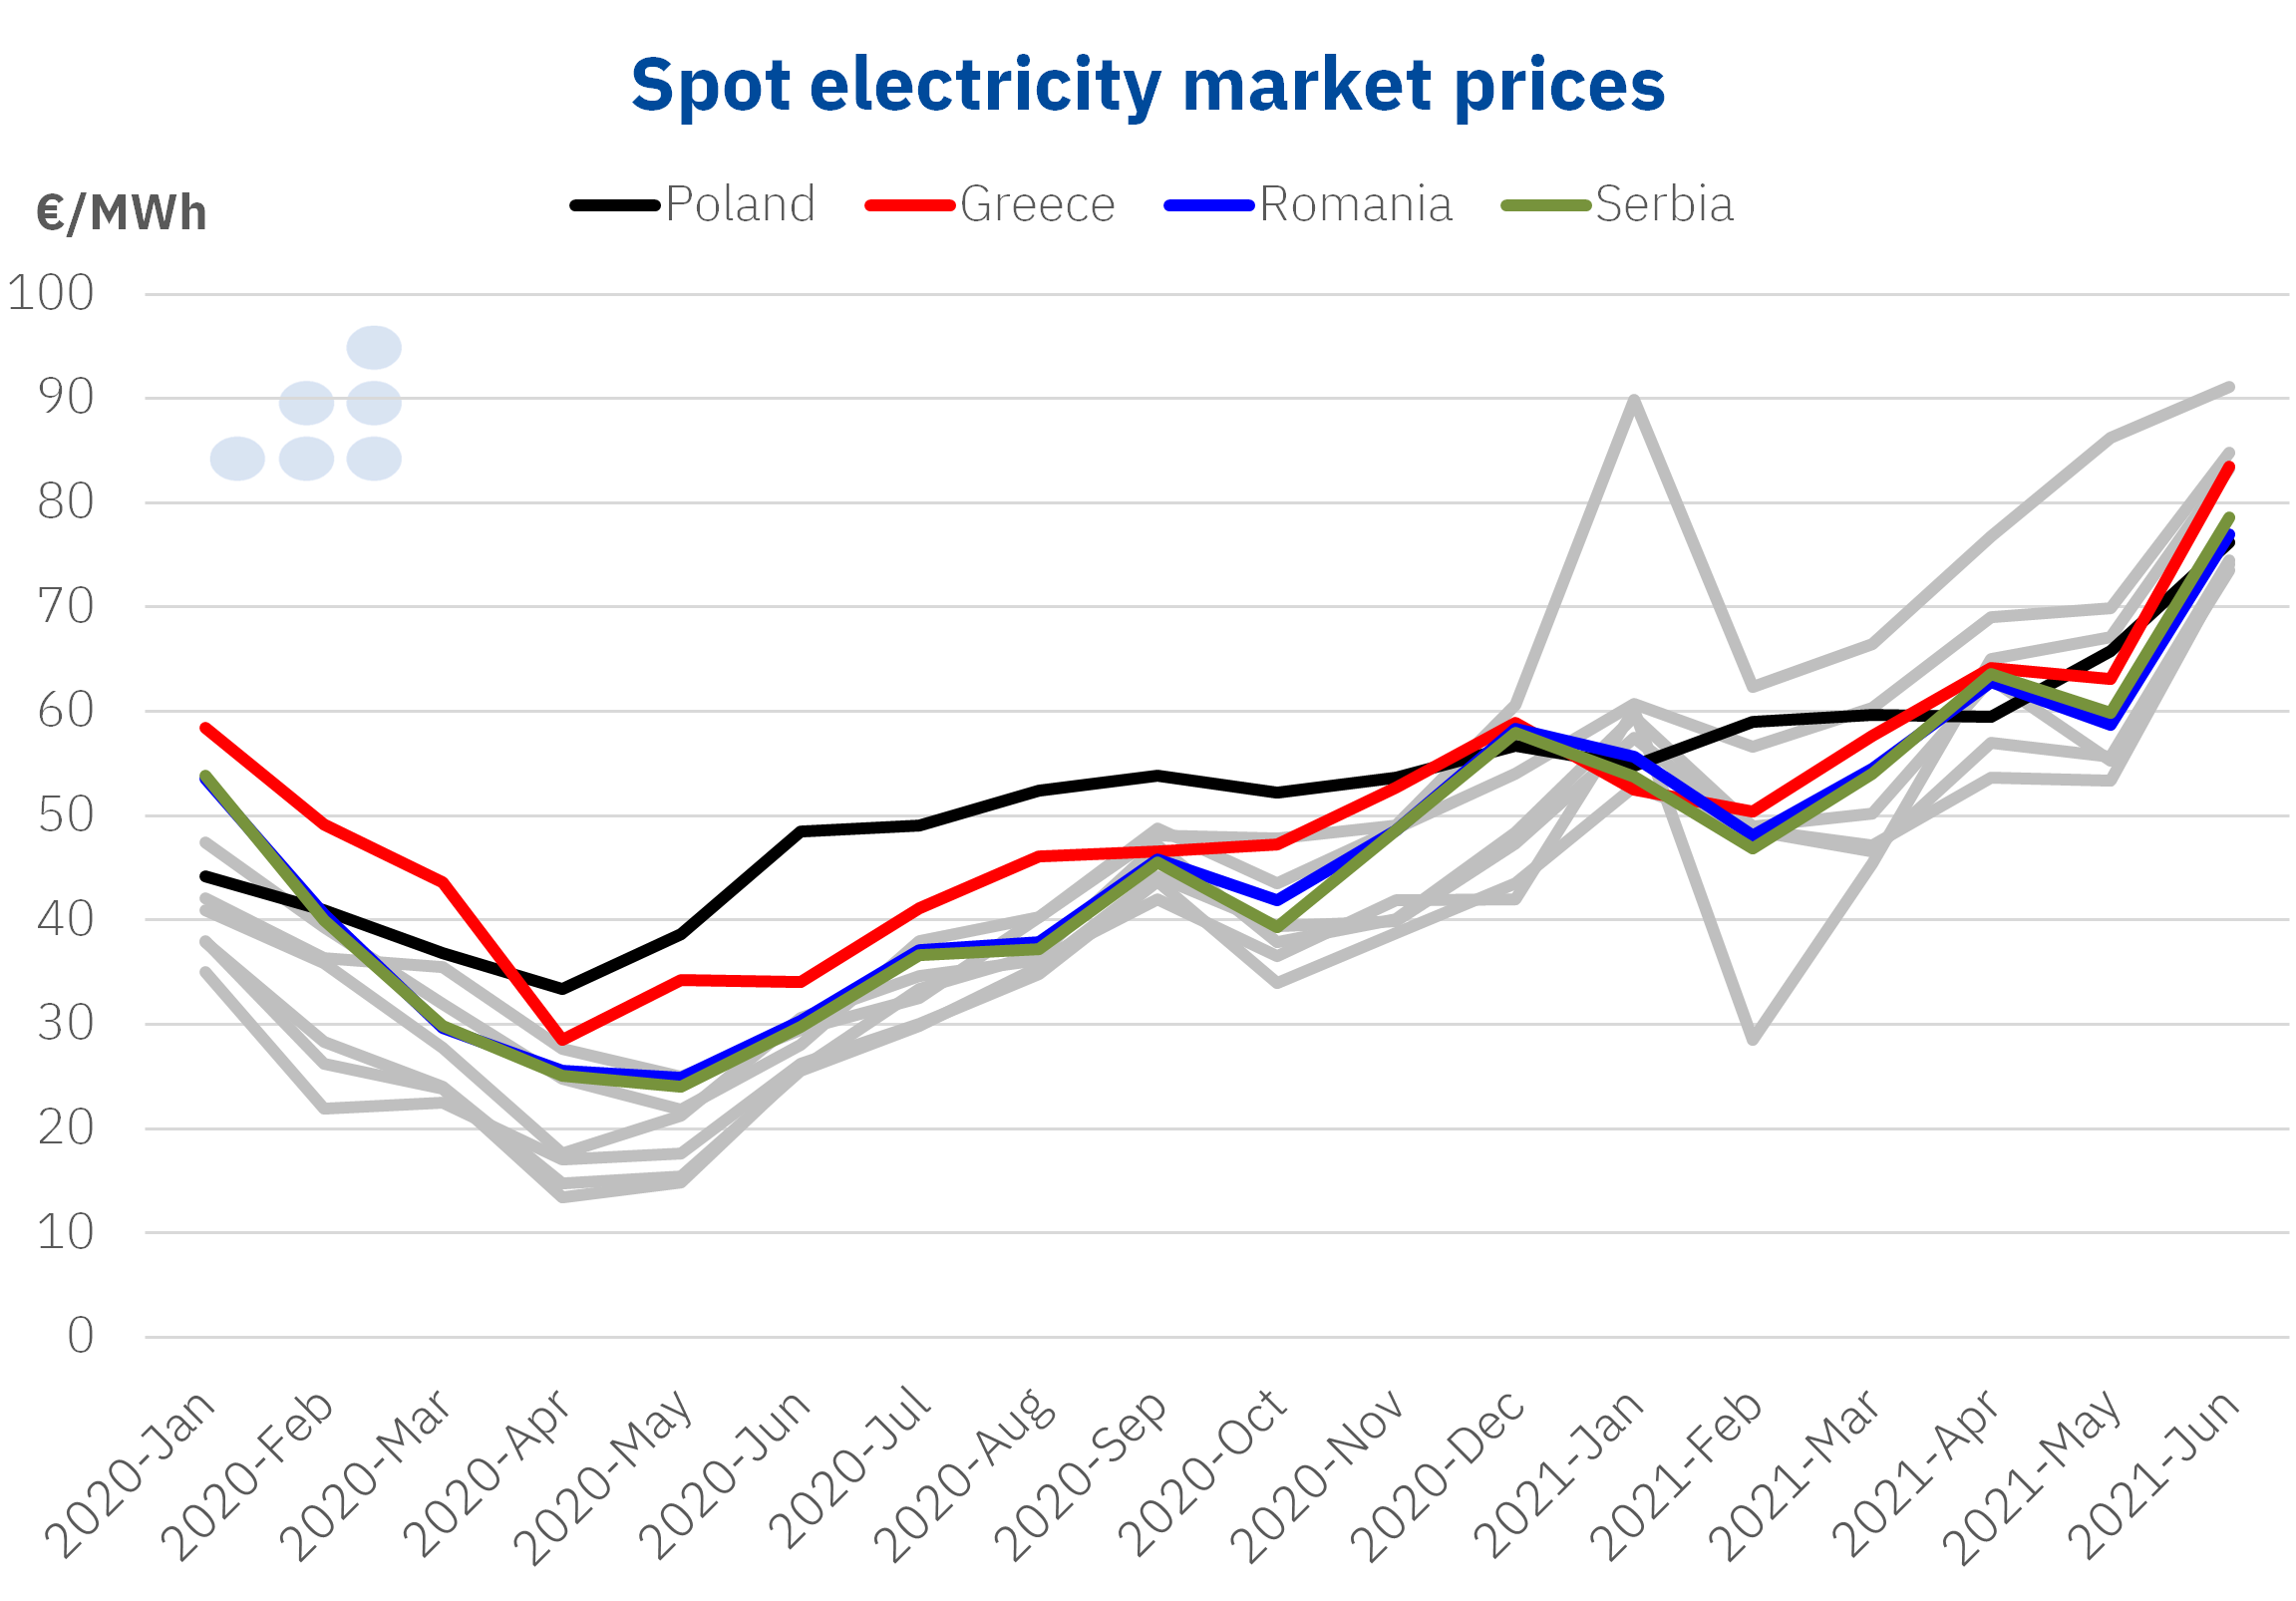 AleaSoft - spot electricity market prices poland greece romania serbia